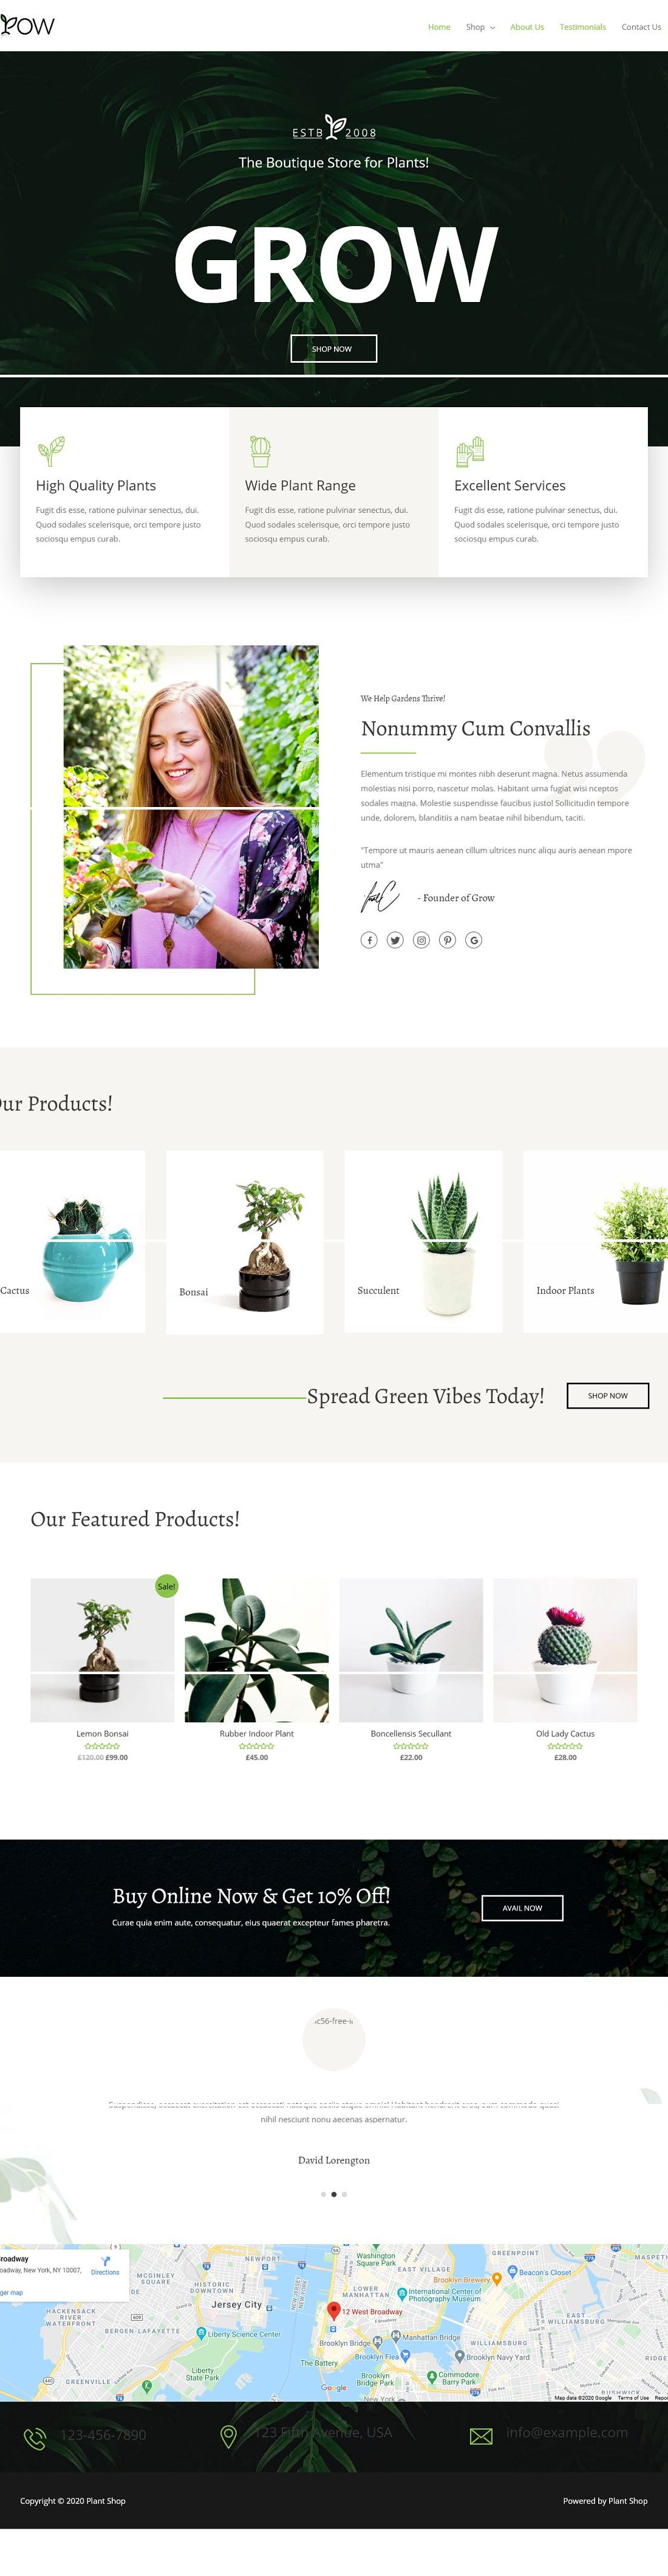 eCom Plant Shop - Multipurpose - Home Page 1280 x 4239